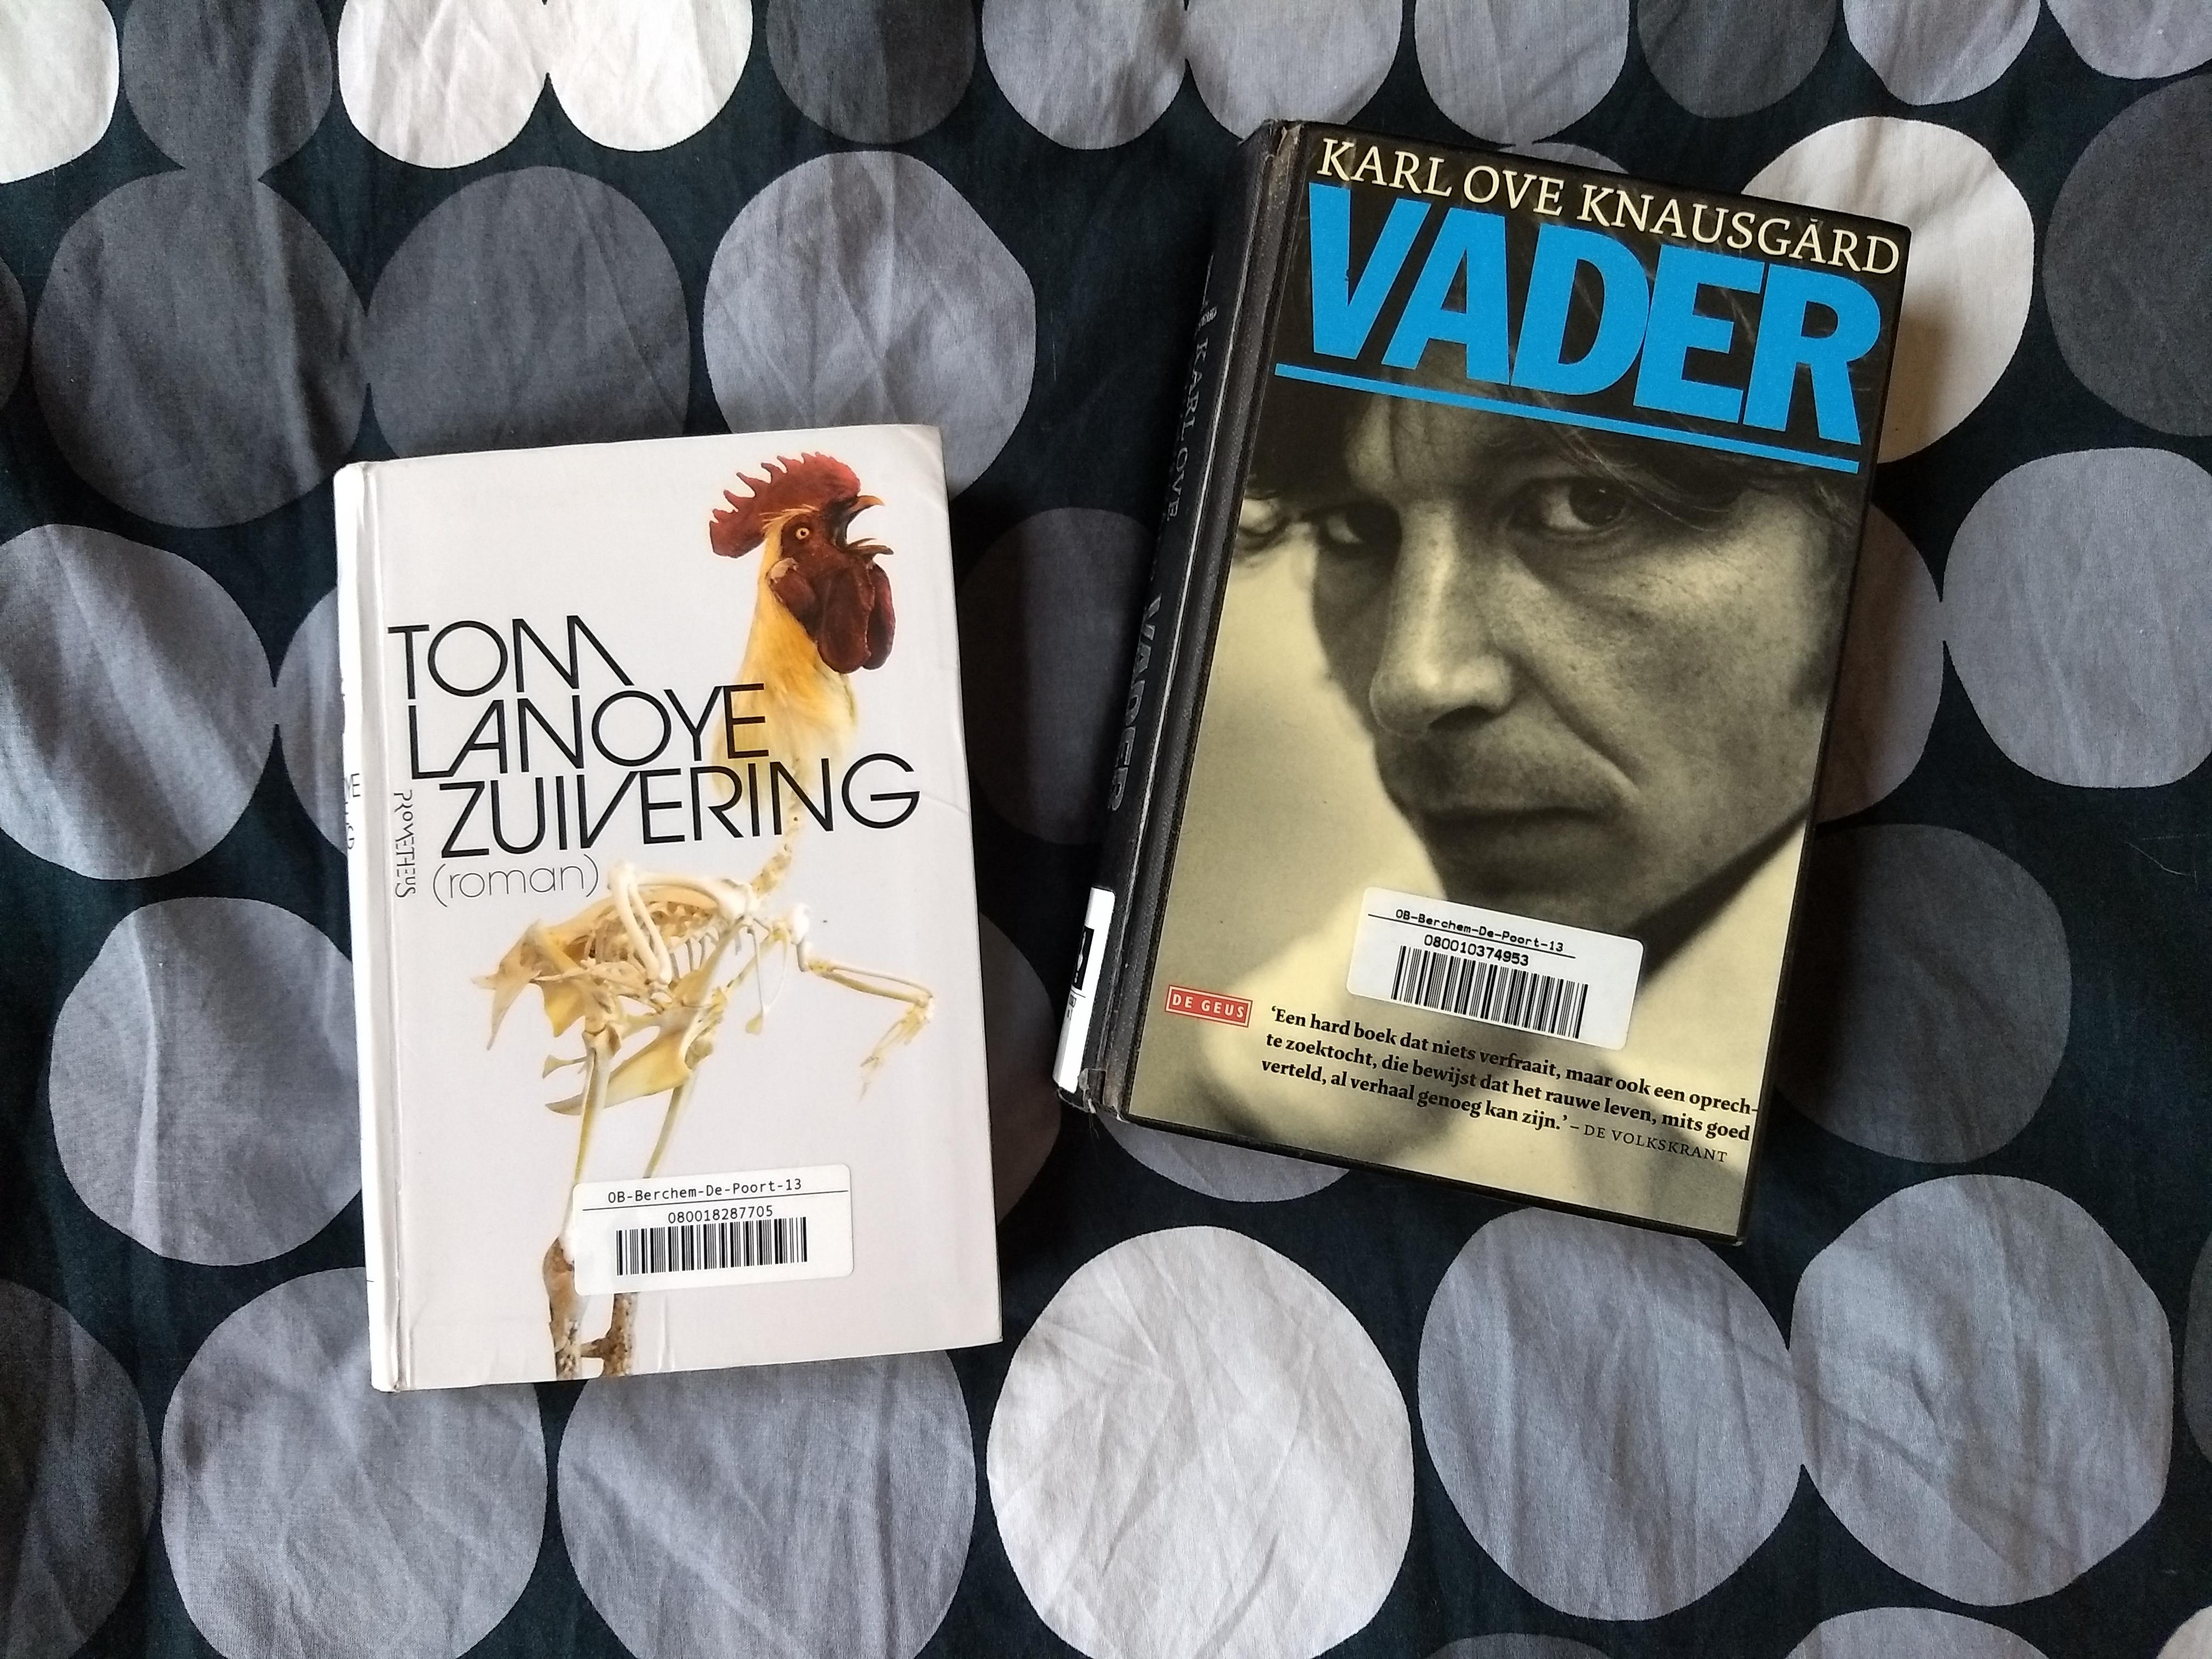 Zuivering Tom Lanoye Vader Karl Ove Knausgard